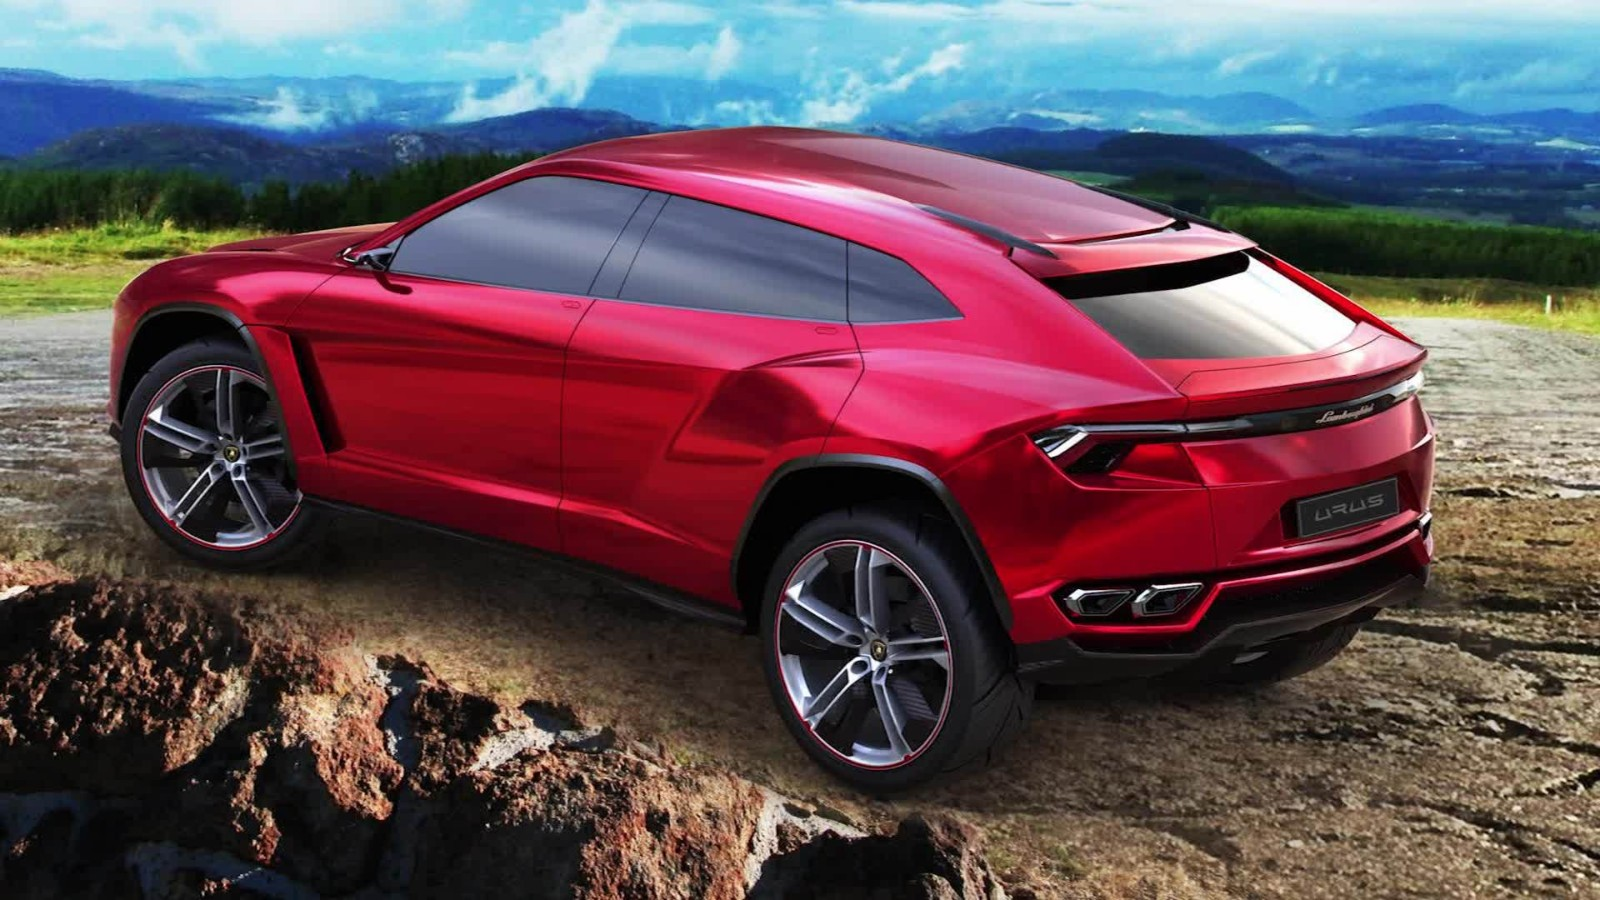 Lamborghini heads off-road - CNN Video